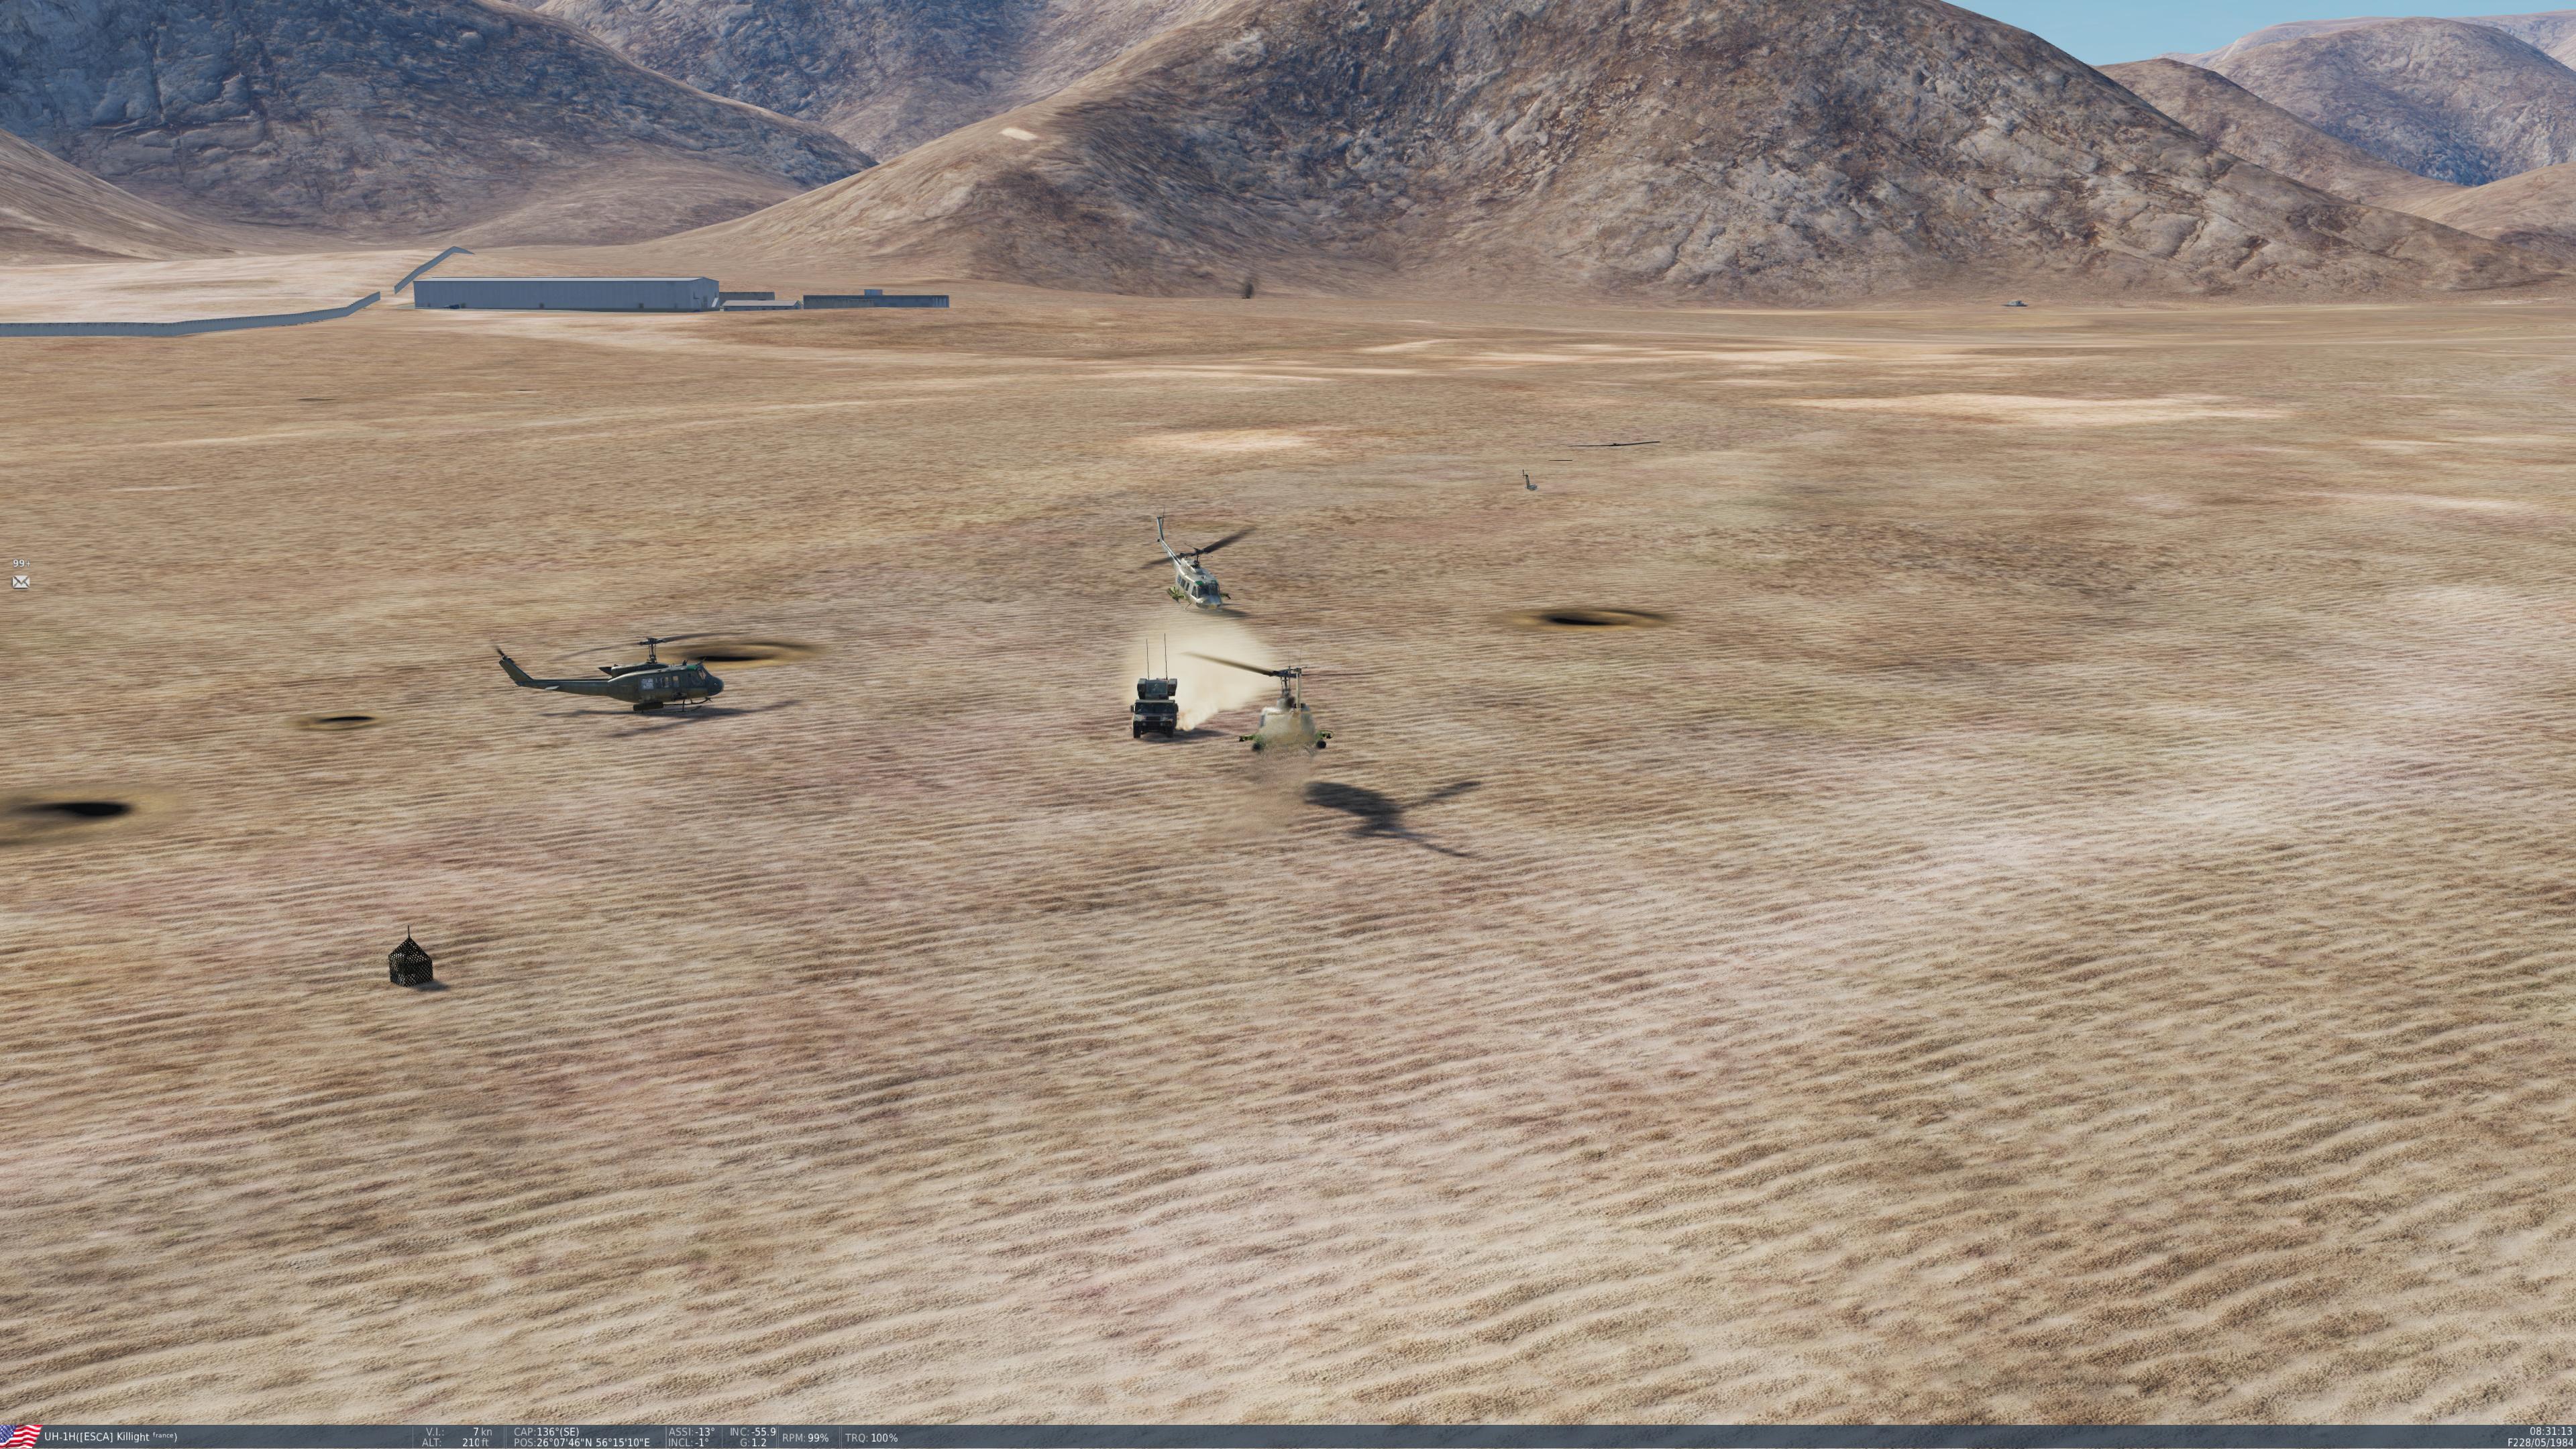 [Cursus UH-1H Huey] Photos de nos missions Bandicam_2021-01-26_22-38-04-052